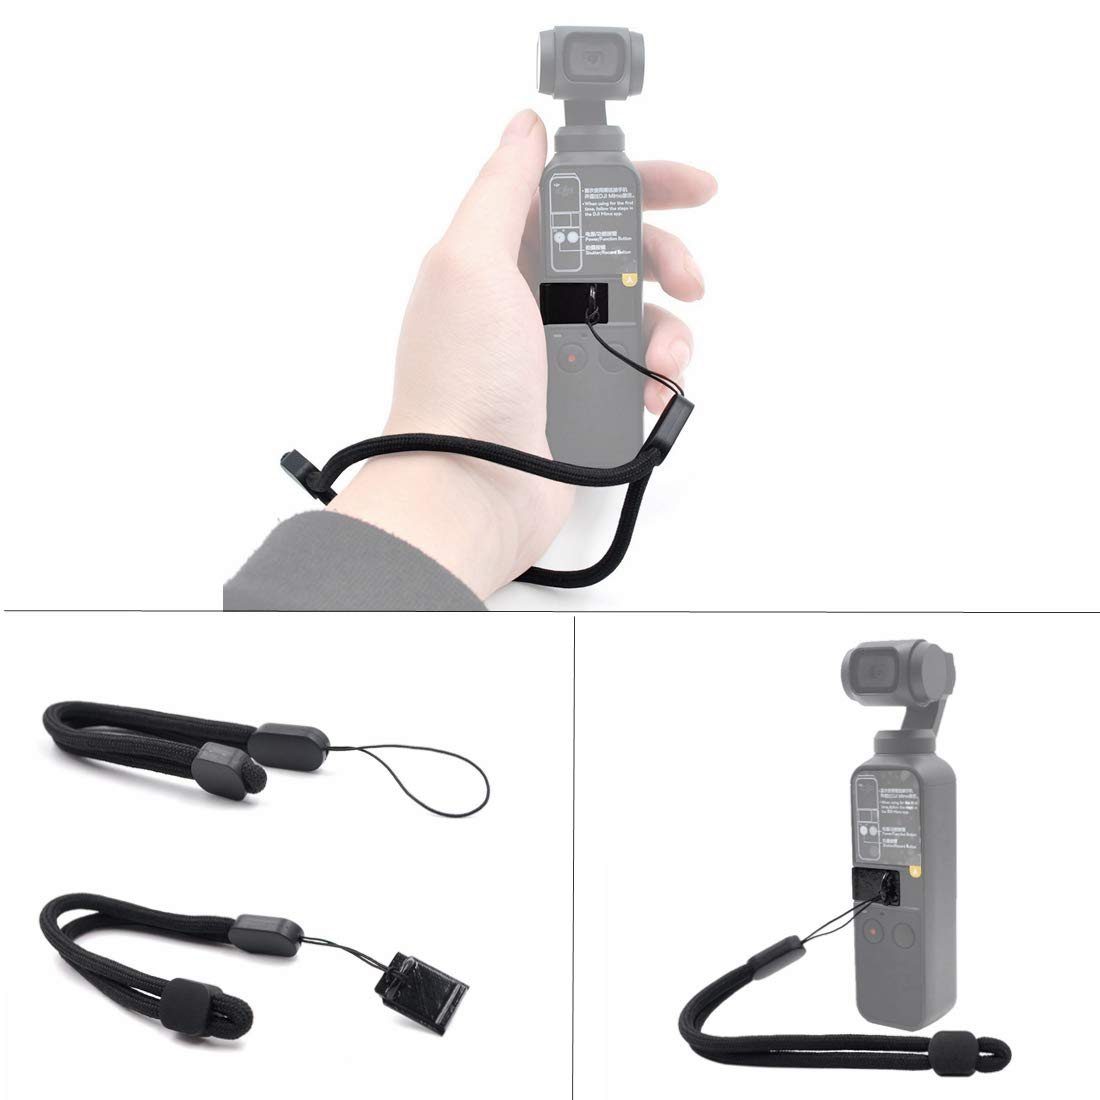 Haoun DJI OSMO ポケット用アクセサリー, 163663898615 B07NS81MGP  Handheld Hang Buckle